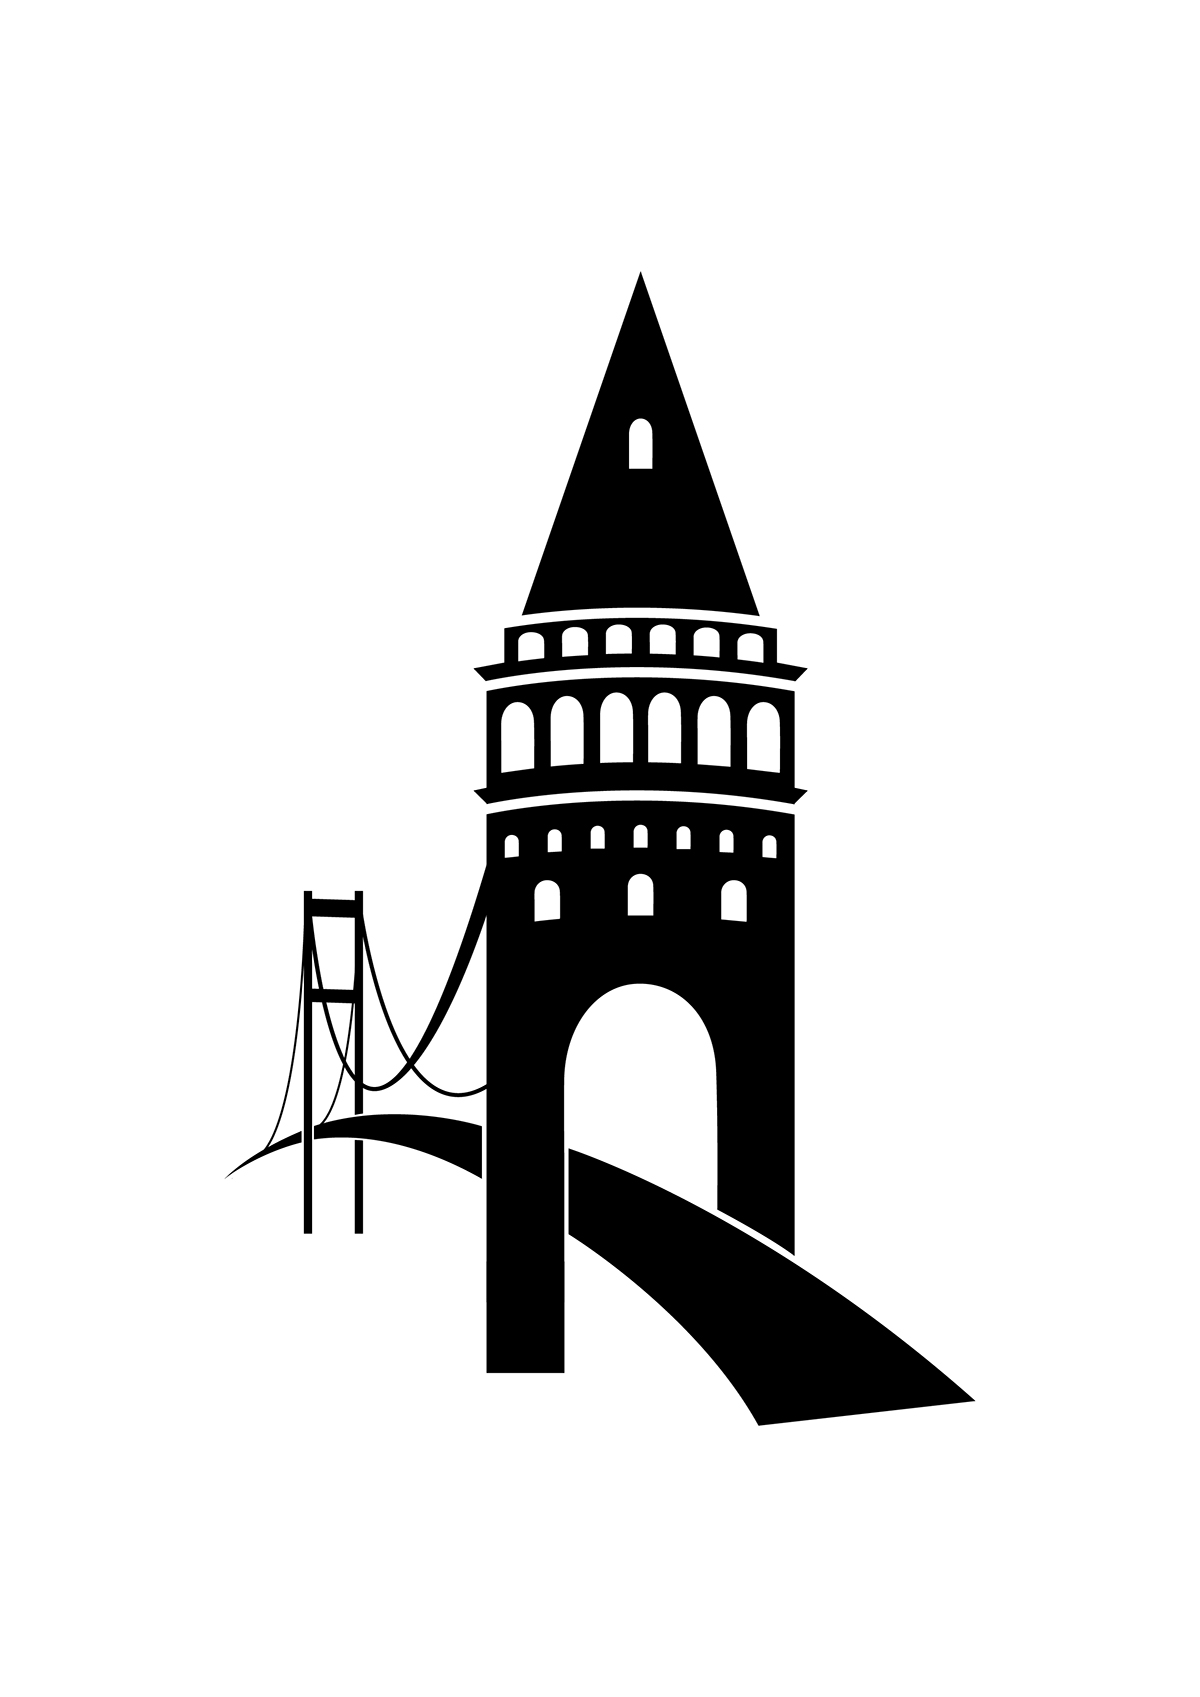 Graphic Design University In Turkey